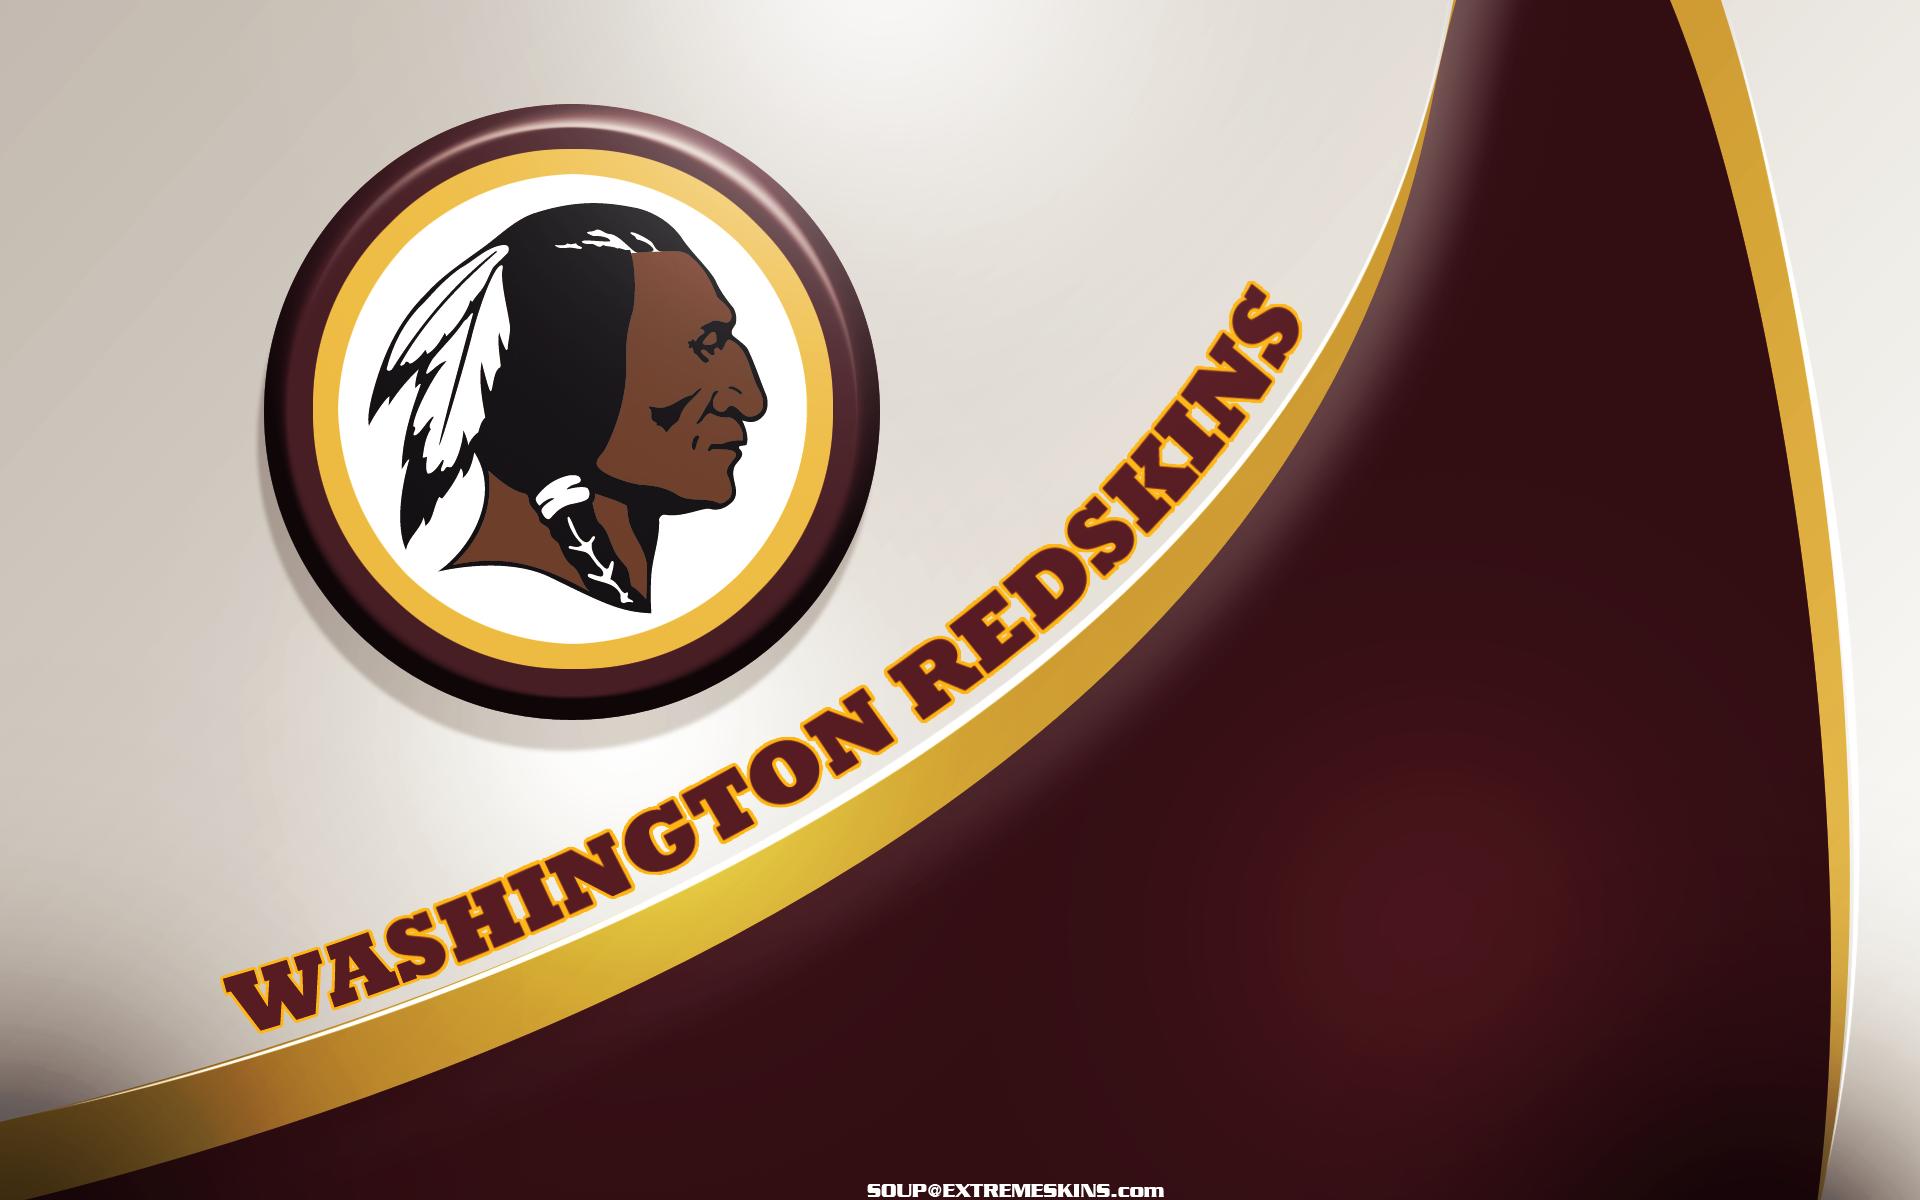 Washington Redskins wallpapers Washington Redskins background 1920x1200